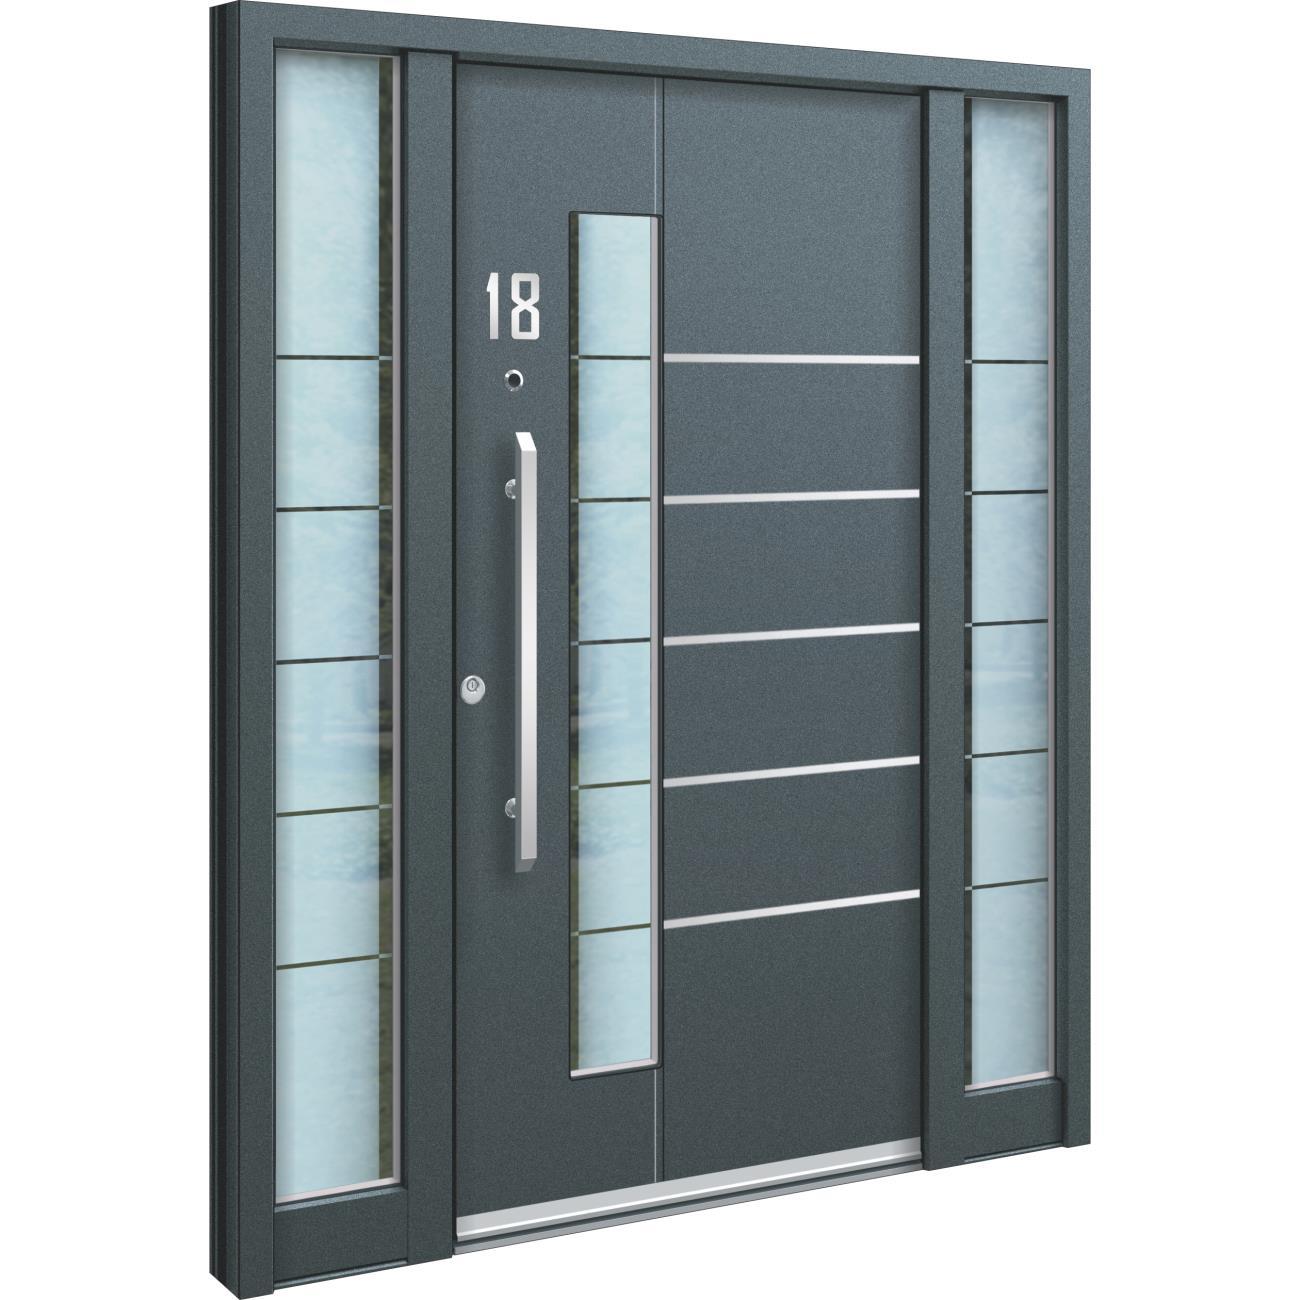 Doppelflügelige tür Doppelflügelige Türen, Doppelflügelige Tür, Doppelflügelige ...